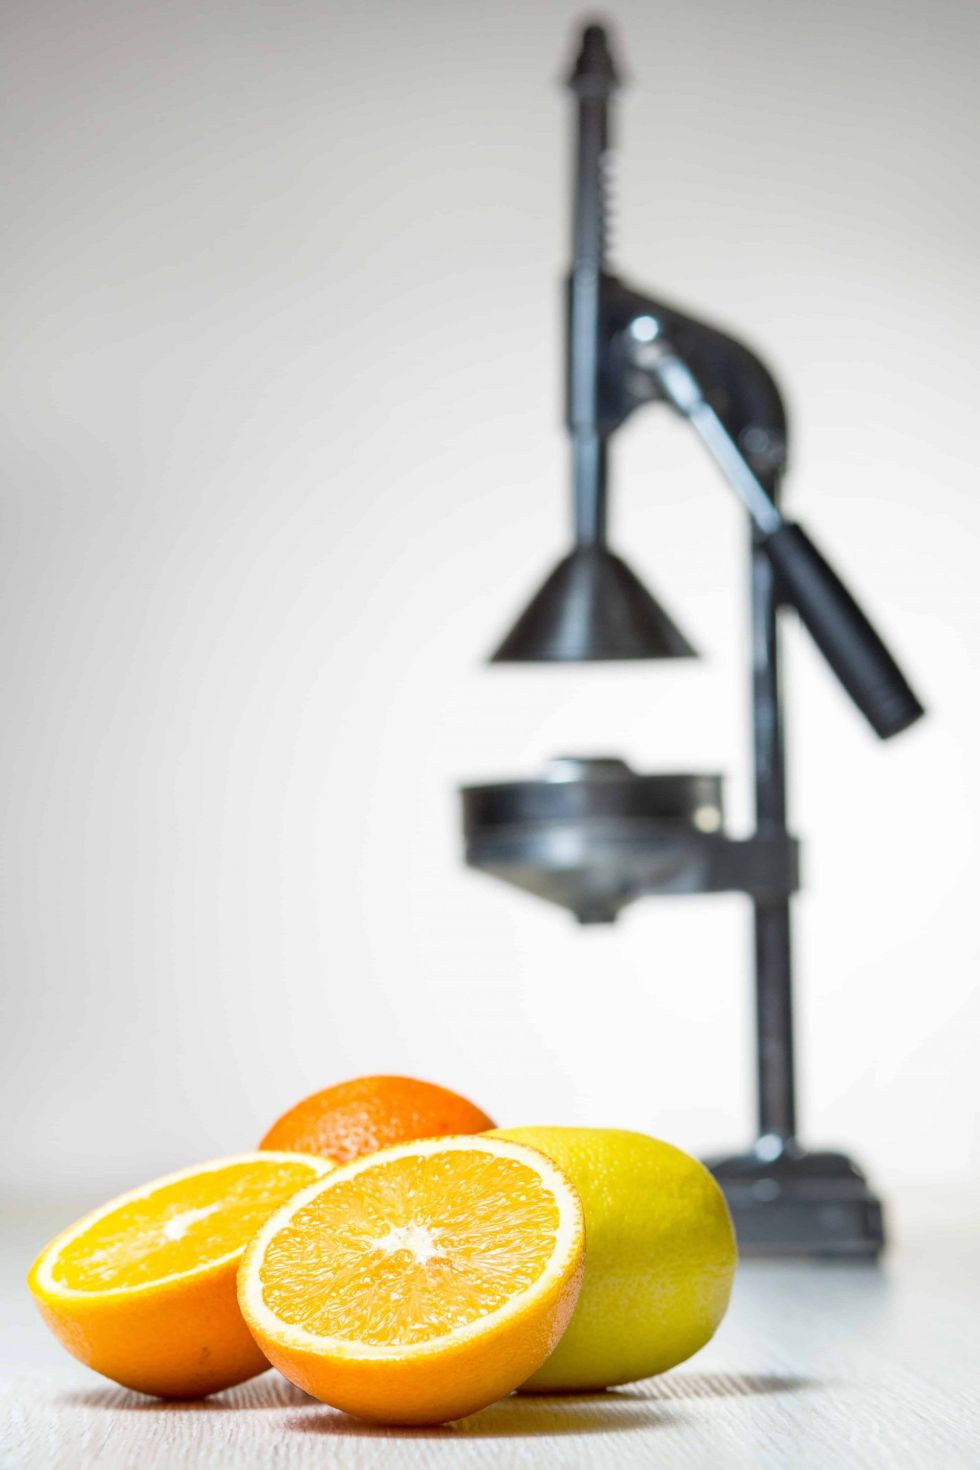 Commercial Citrus juicer with oranges